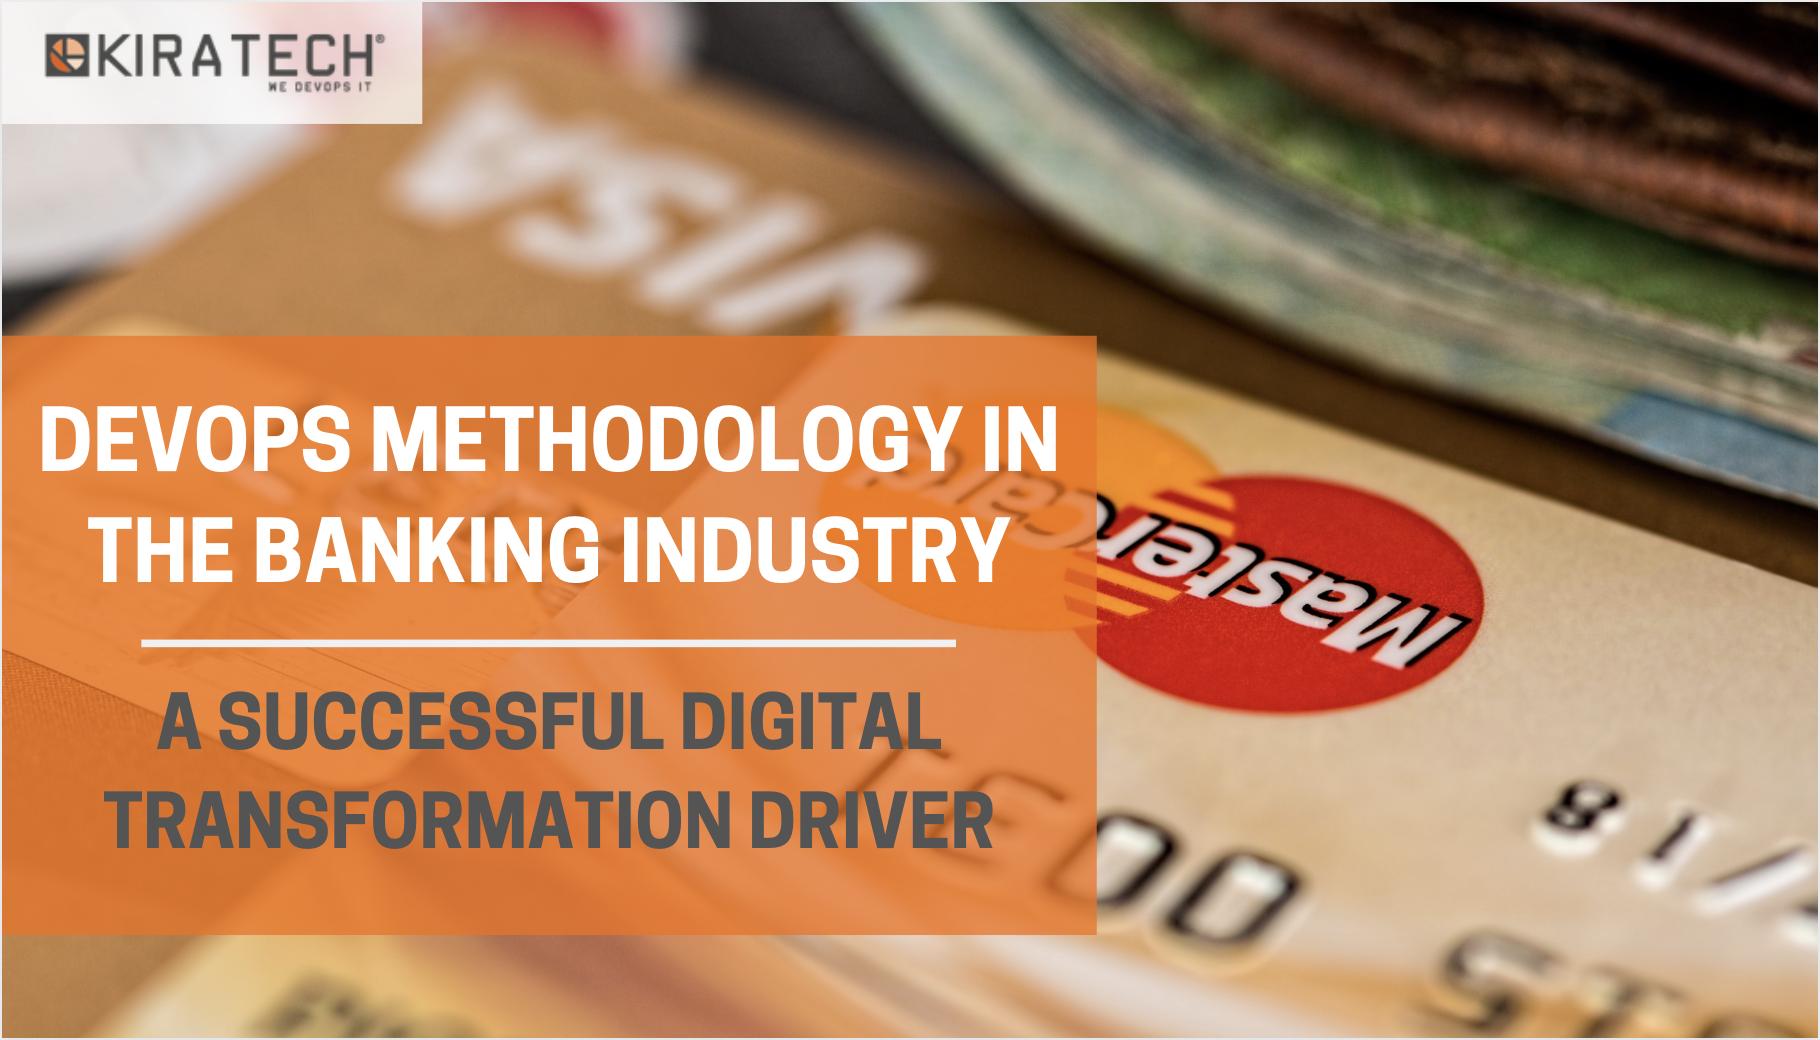 Kiratech_DevOps_methodology_banking_industry_blog_EN